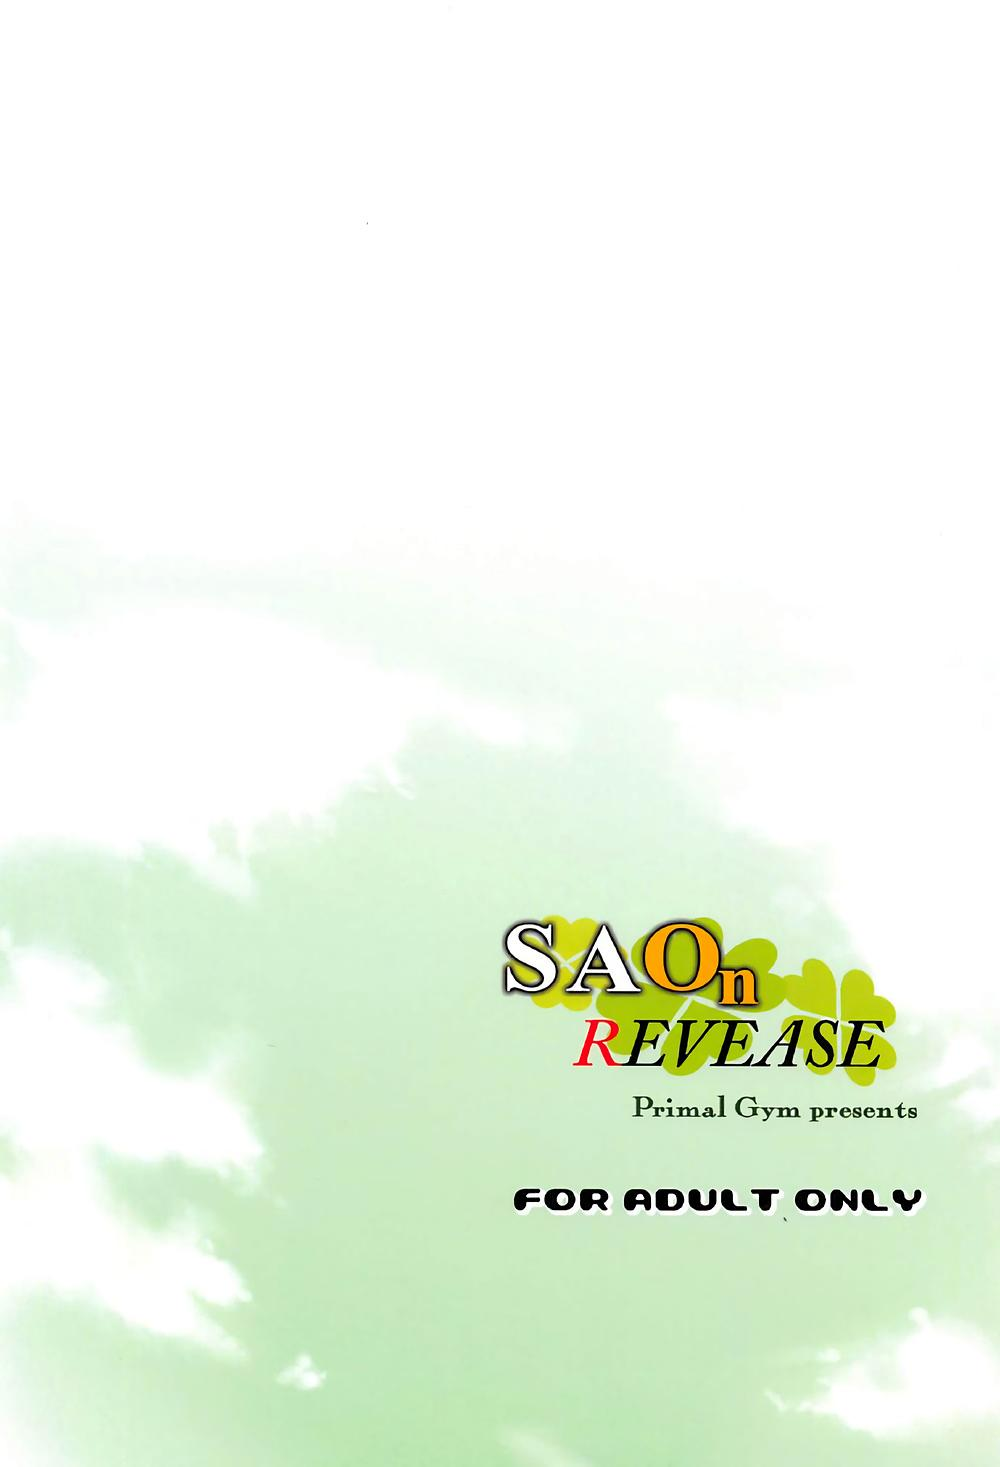 SAOn REVERSE 21